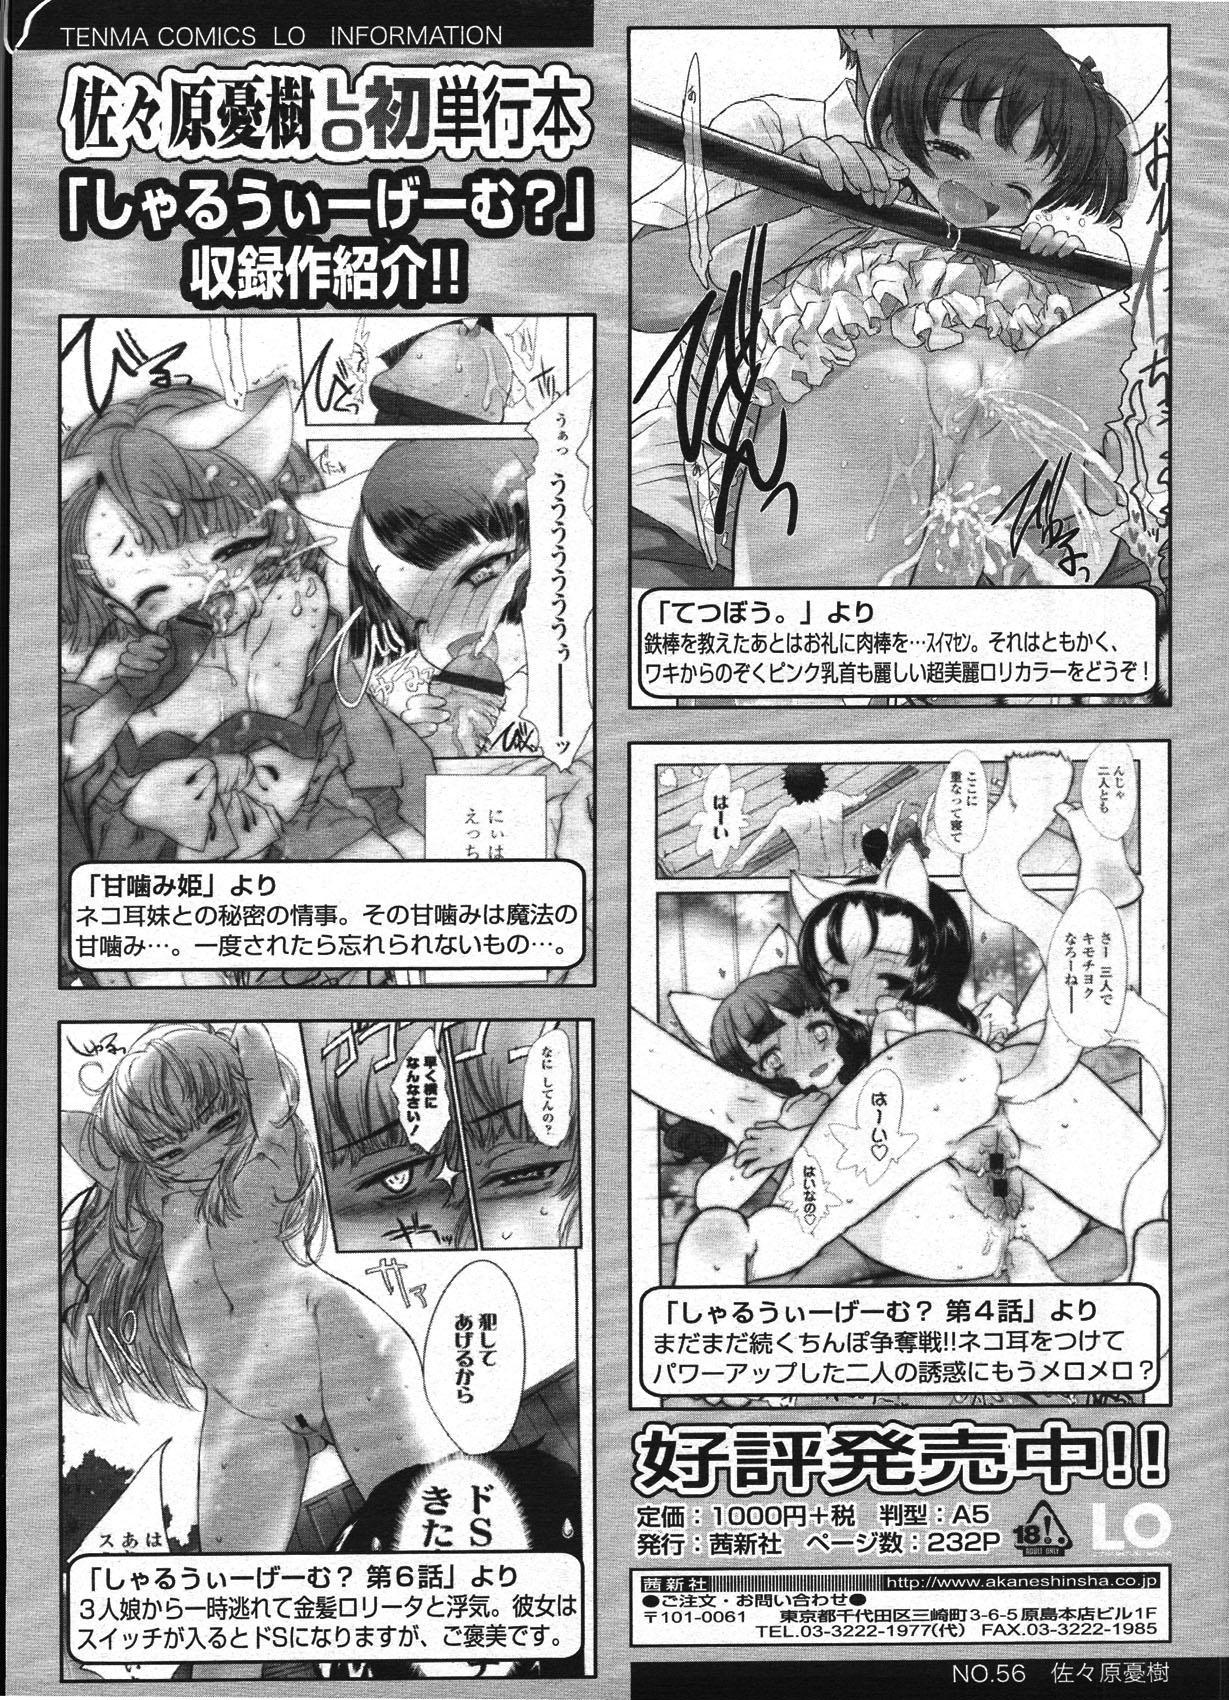 Comic LO 2009-04 Vol. 61 80